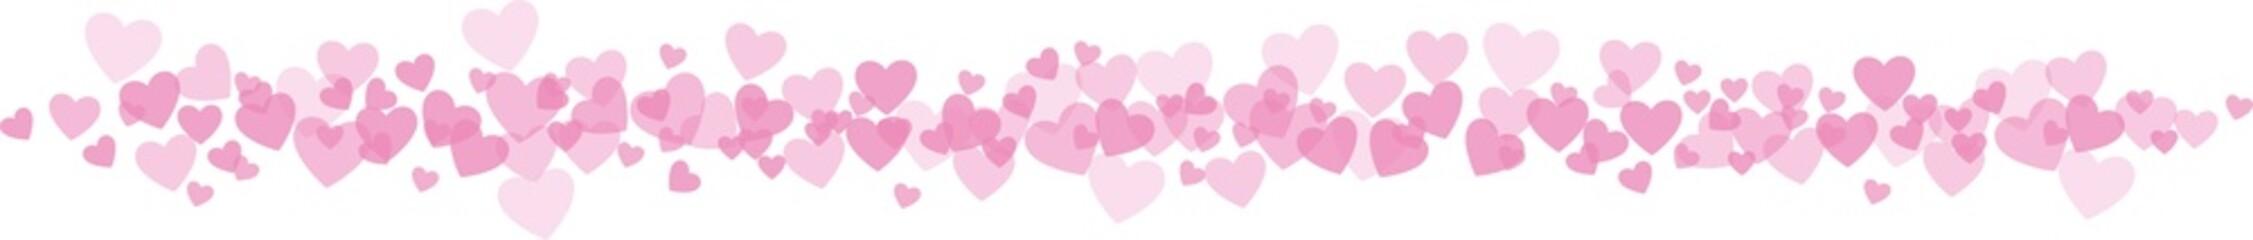 amour coeur frise horizontal kazy